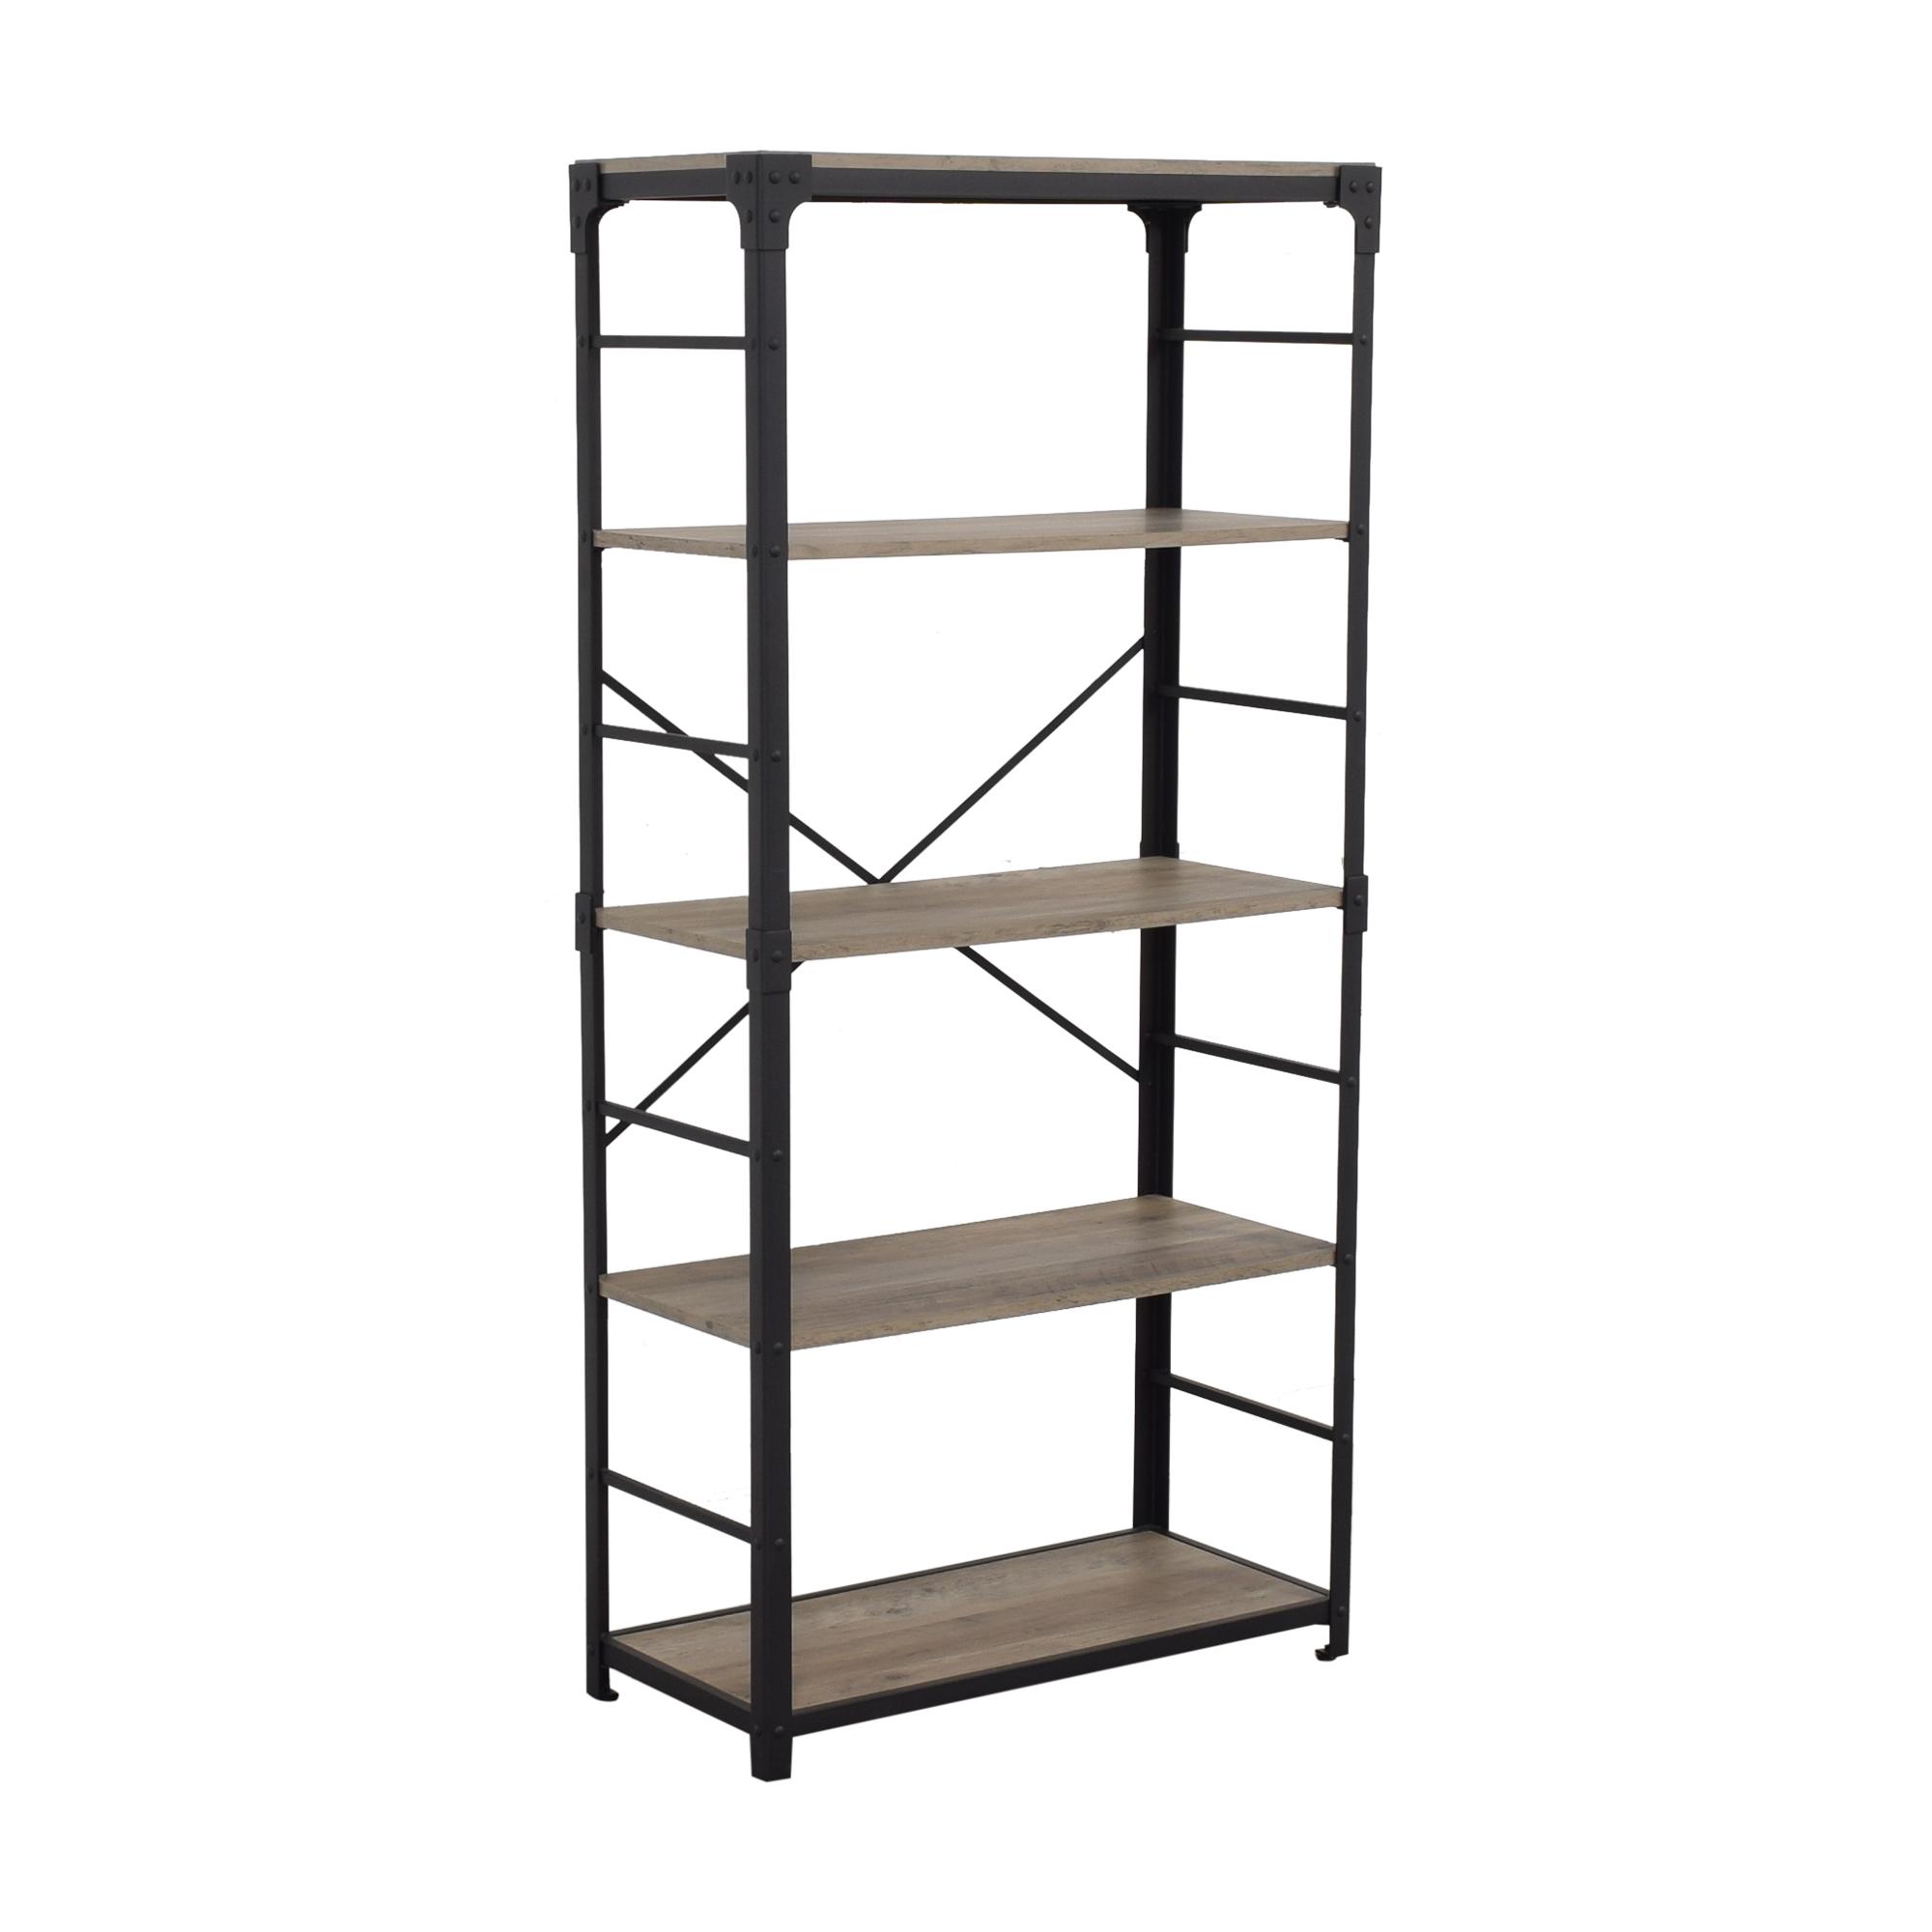 buy Room & Board Bookshelf Room & Board Bookcases & Shelving